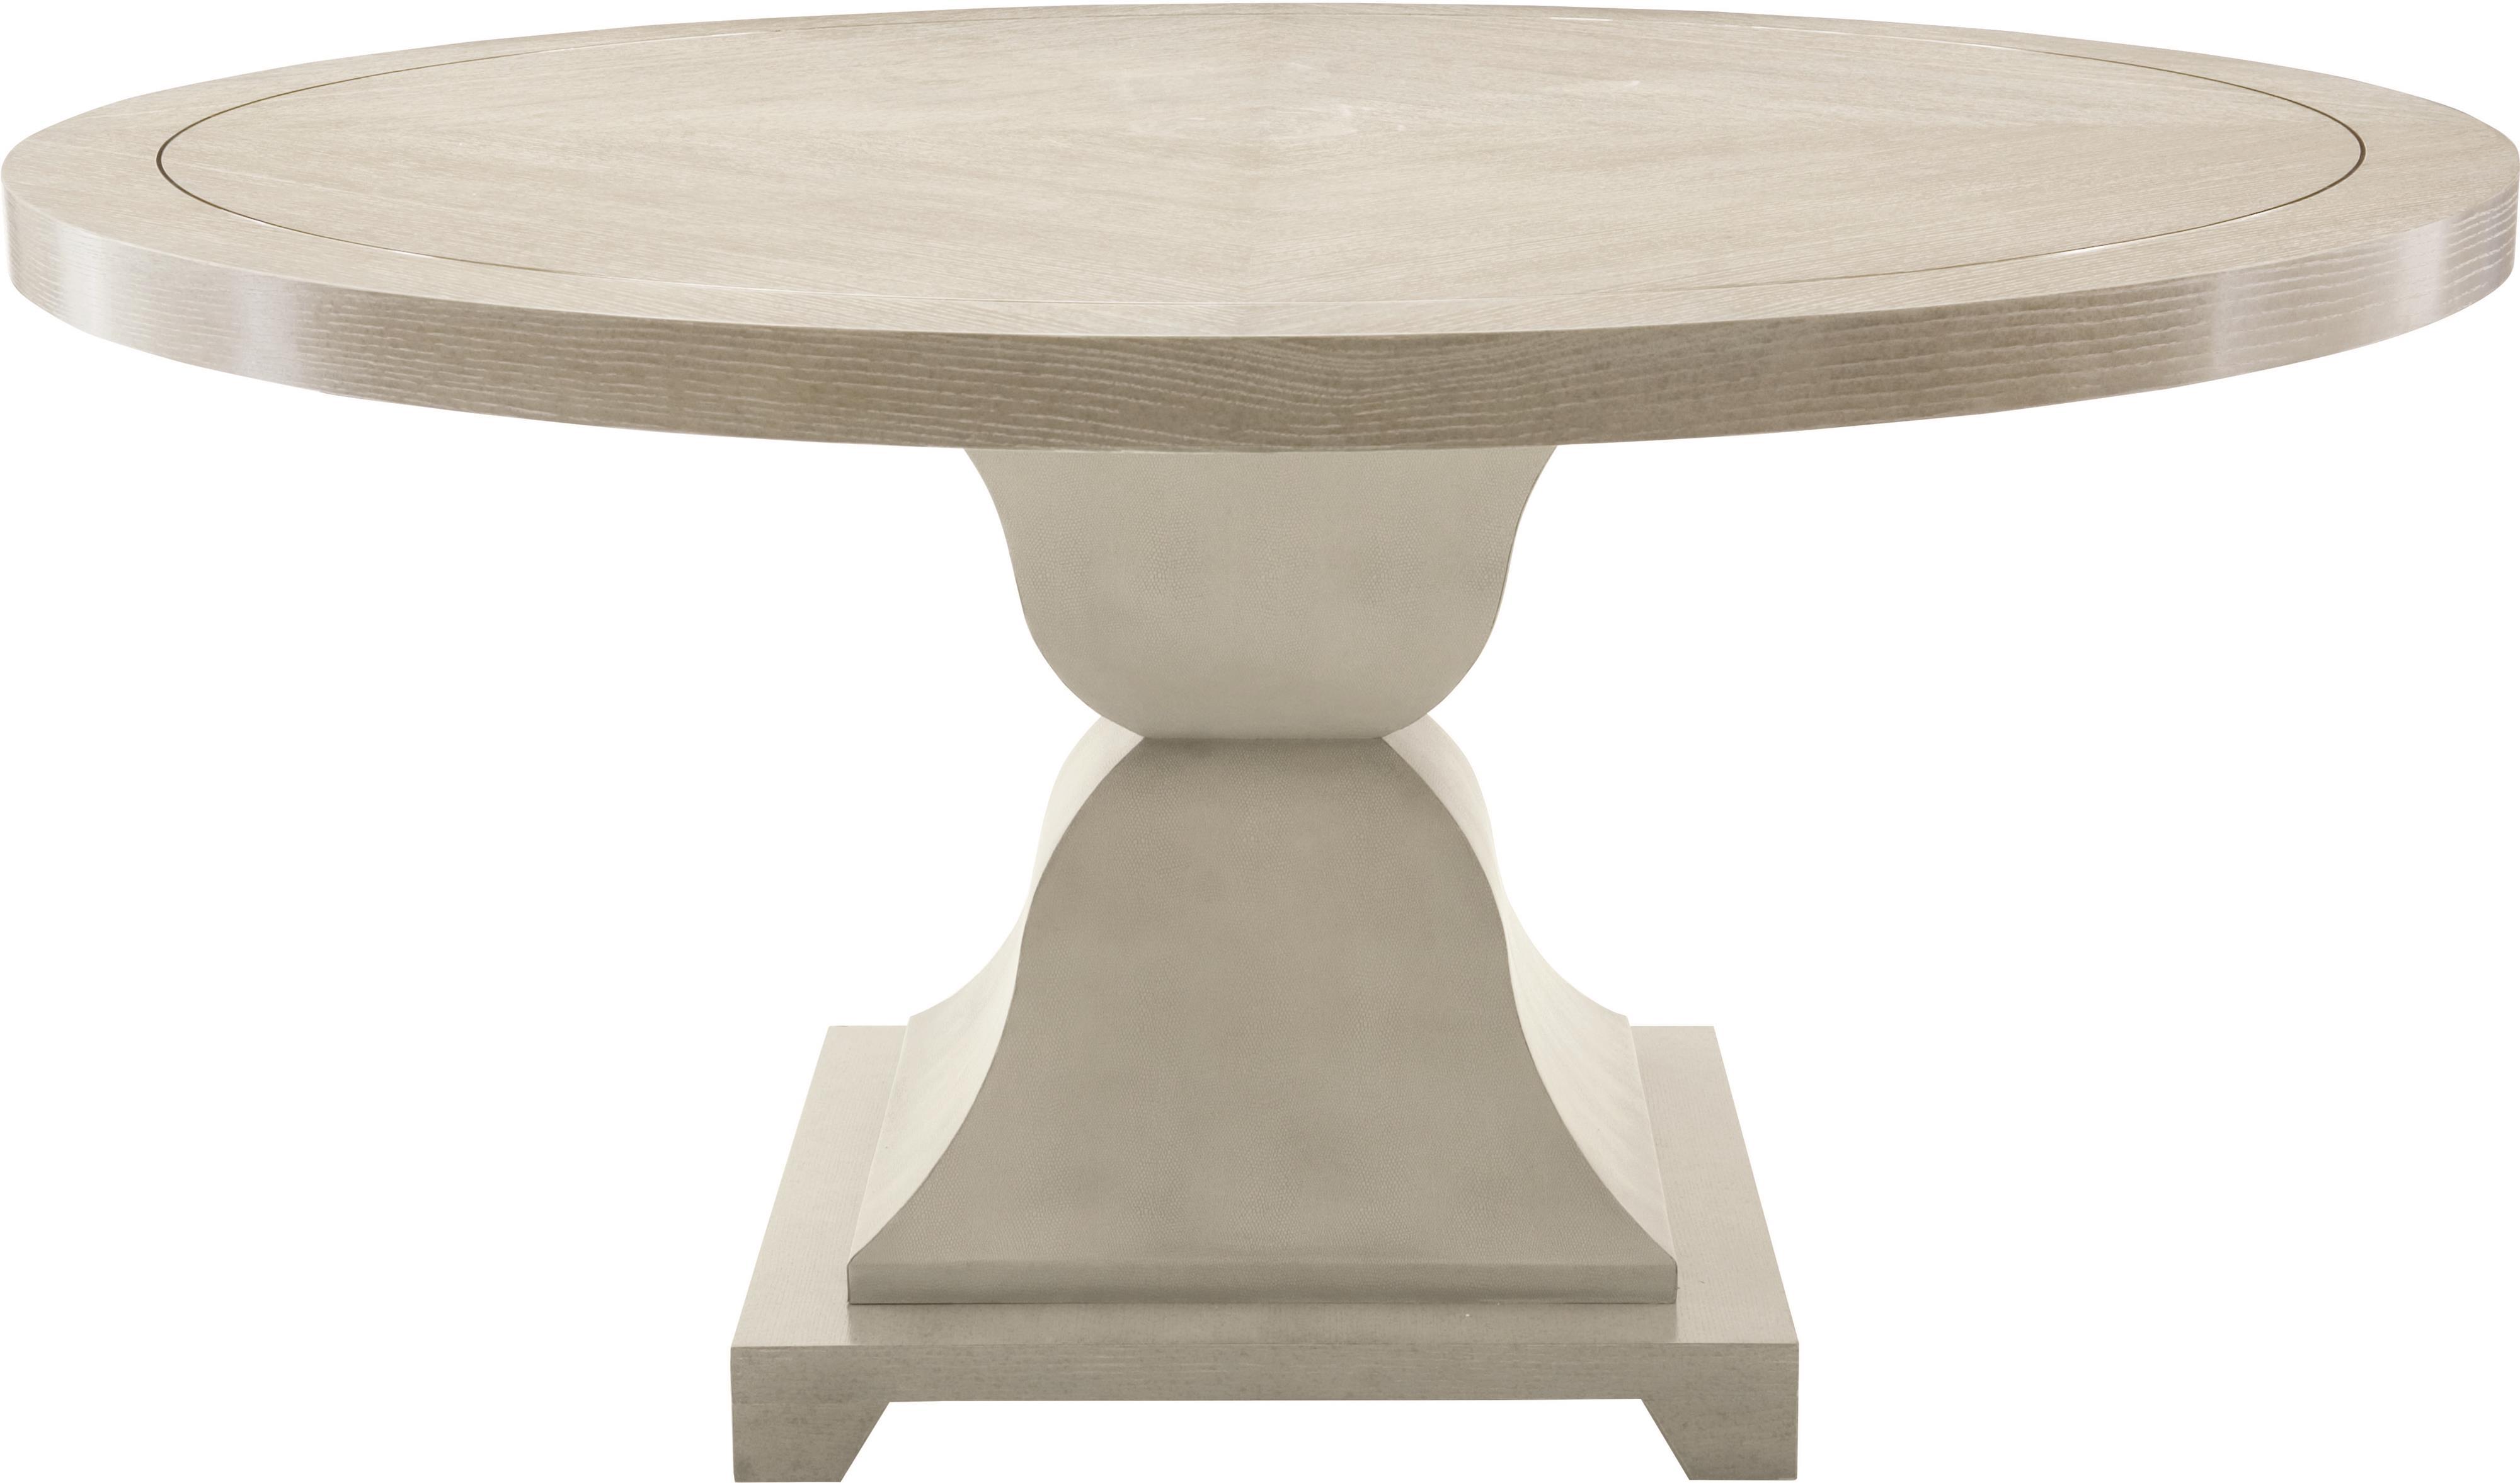 Bernhardt Criteria Round Dining Table - Item Number: 363-273G+1G